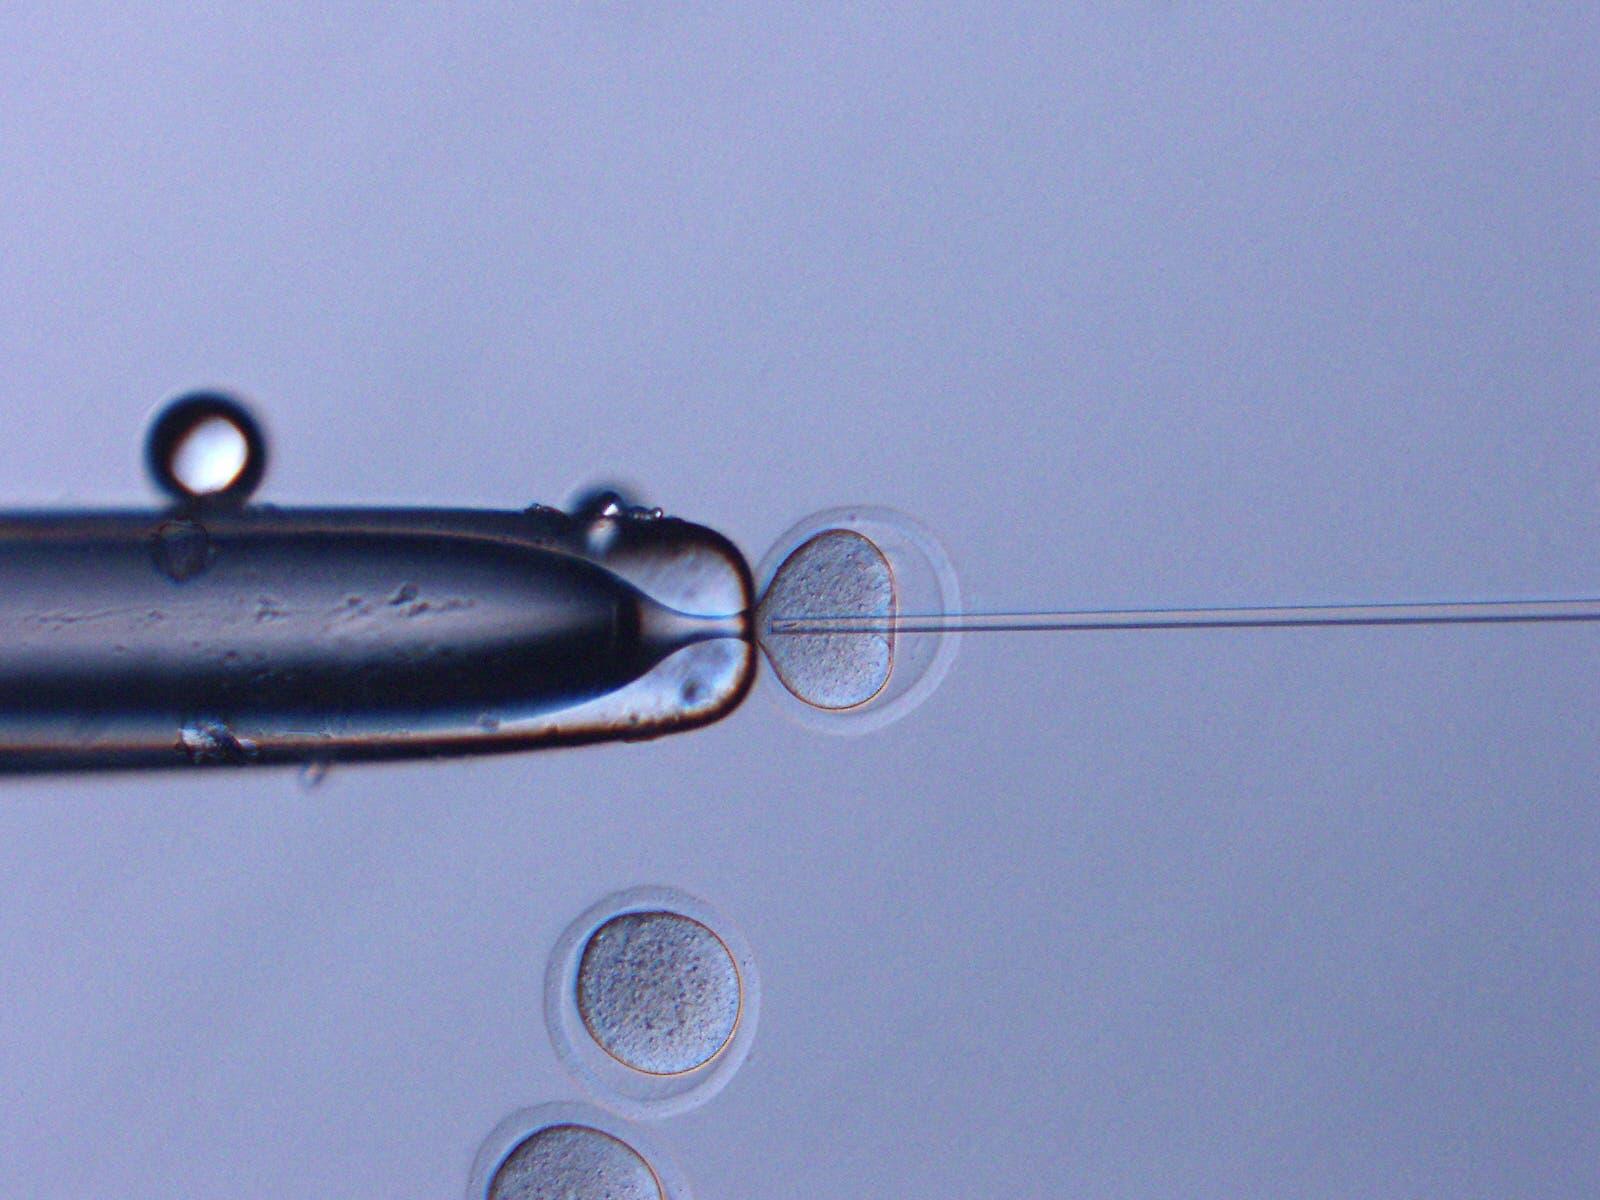 This July 21, 2020, image courtesy of Teruhiko Wakayama, University of Yamanashi, shows space sperm were injected into oocytes. This method was named Intracytoplasmic Sperm Injection (ICSI). (AFP)